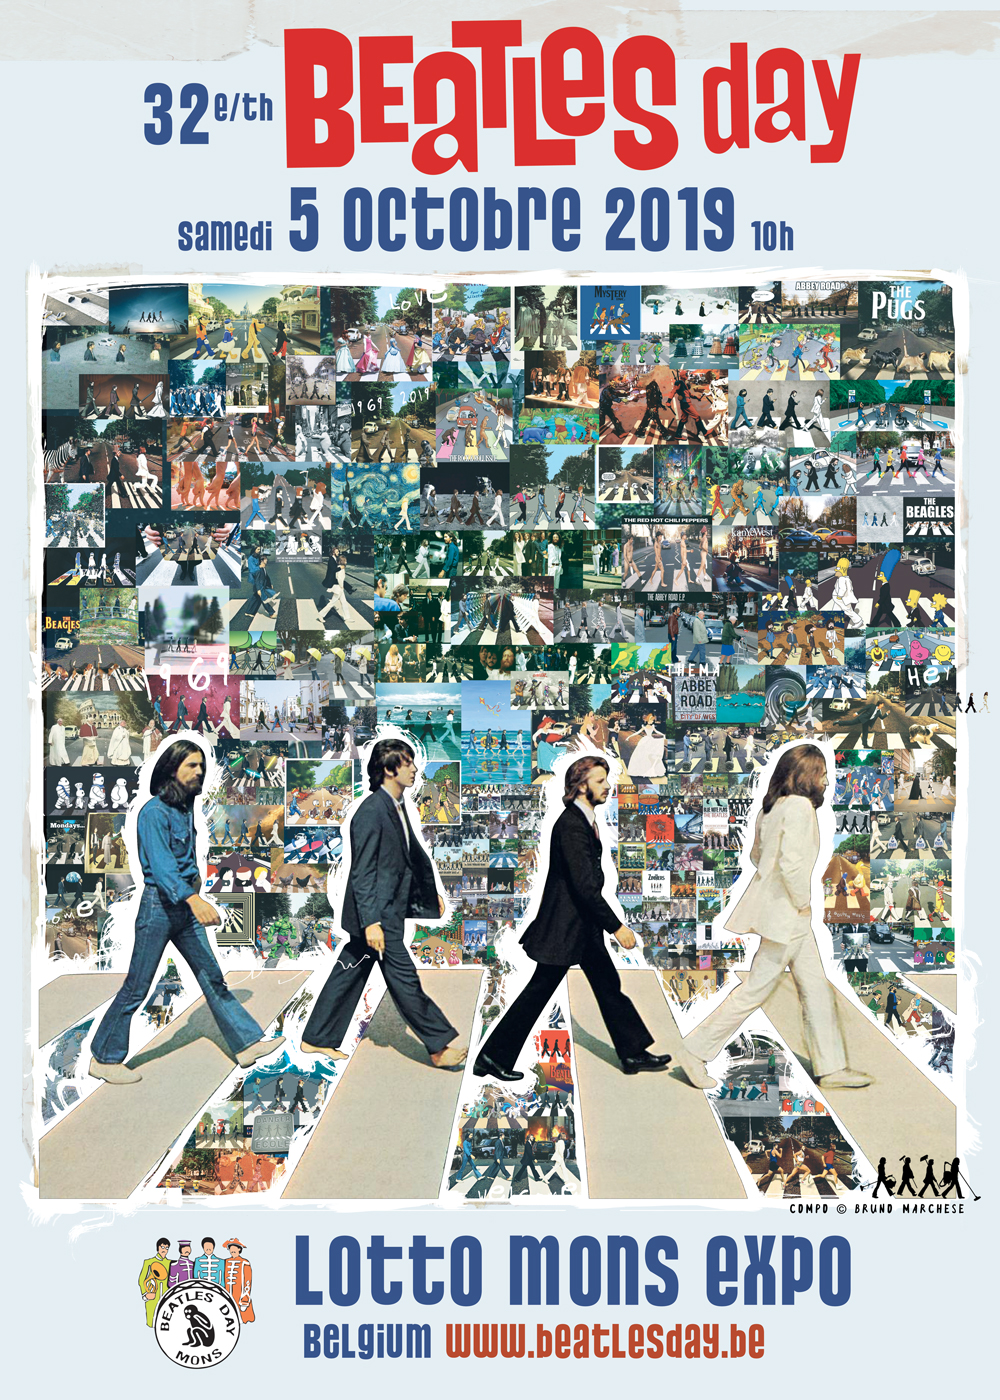 32ème Beatles Day samedi 5 octobre 2019 au Lotto Mons Expo